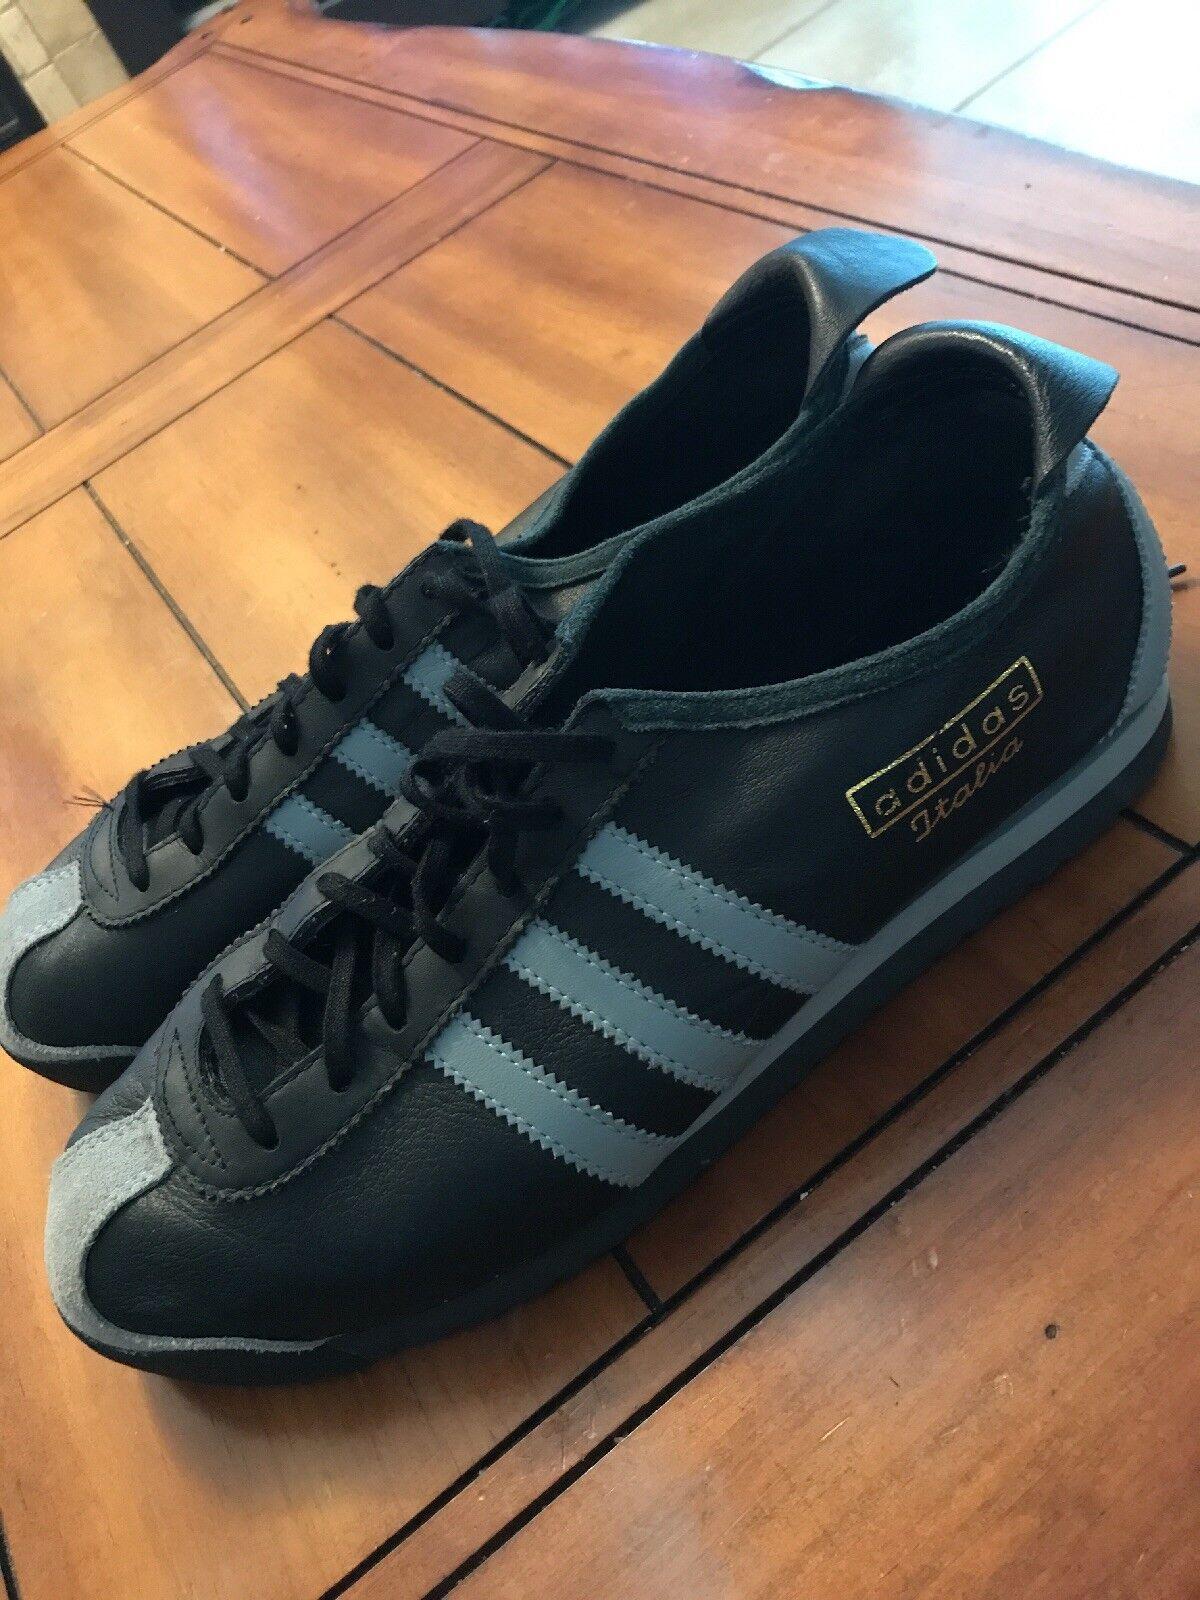 cef37e02ee75 adidas adidas adidas italia ii kangourou hommes cuir chaussures 7, | Le  Prix De Marché 80cfbb